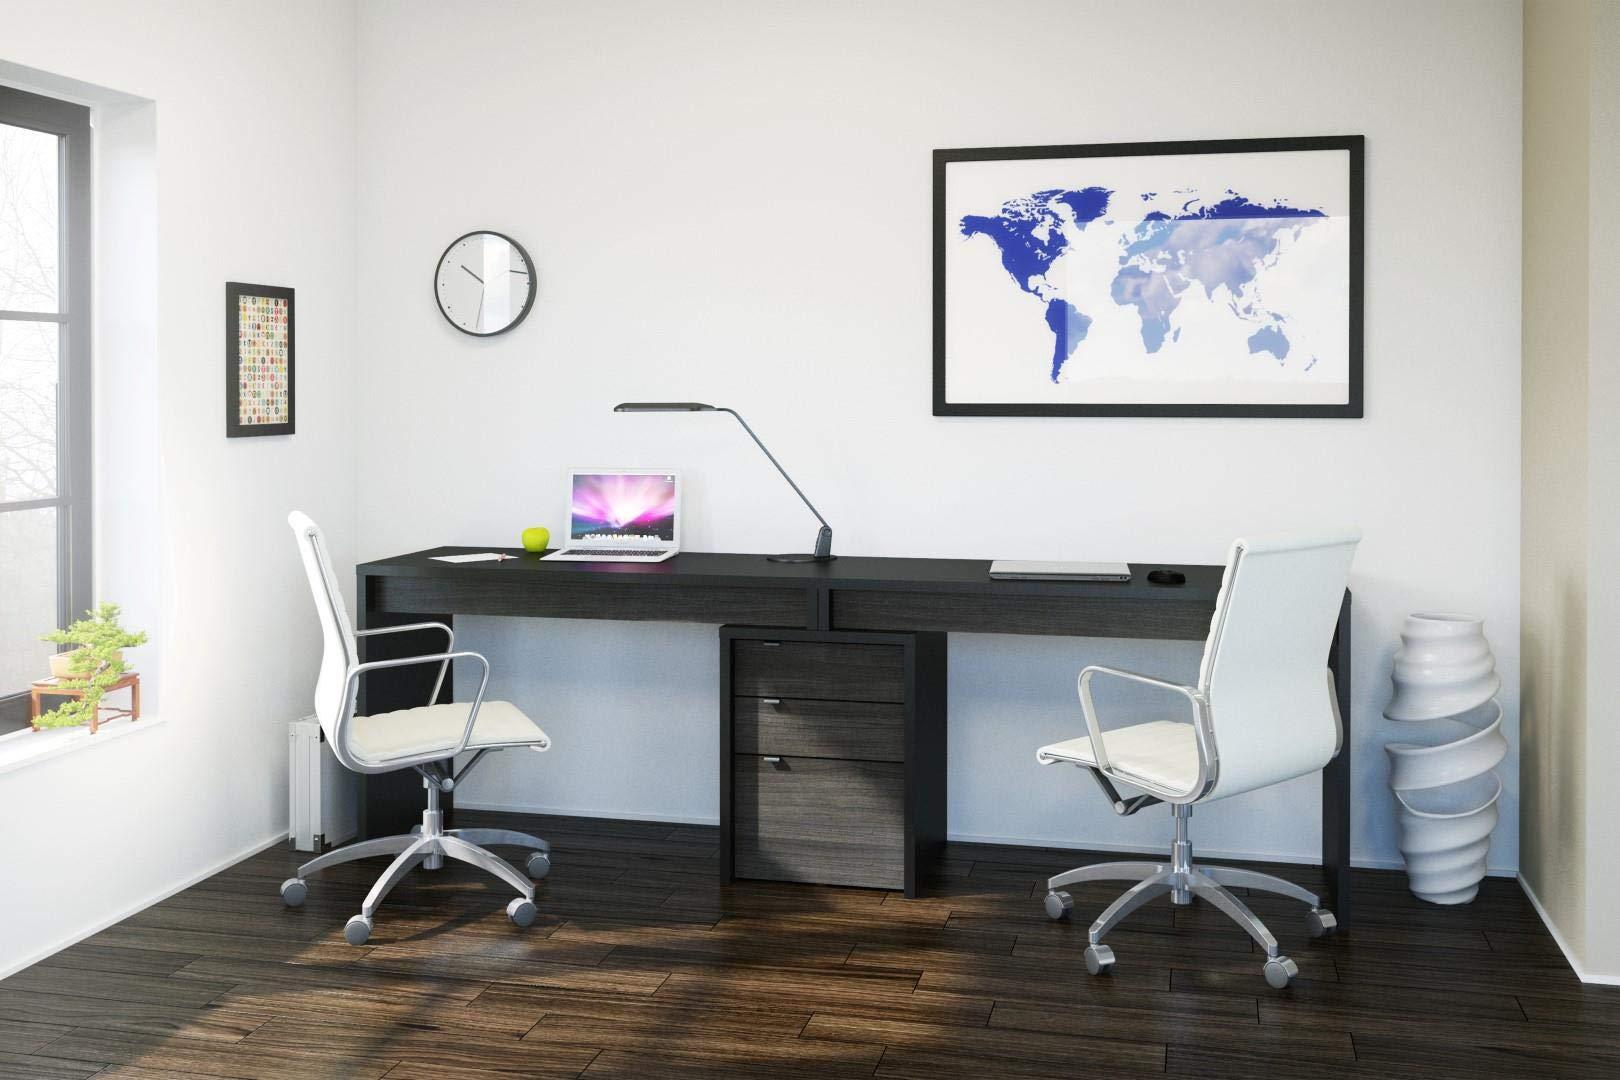 Sereni-T 3 Piece Home Office Set Black and Ebony by Nexera